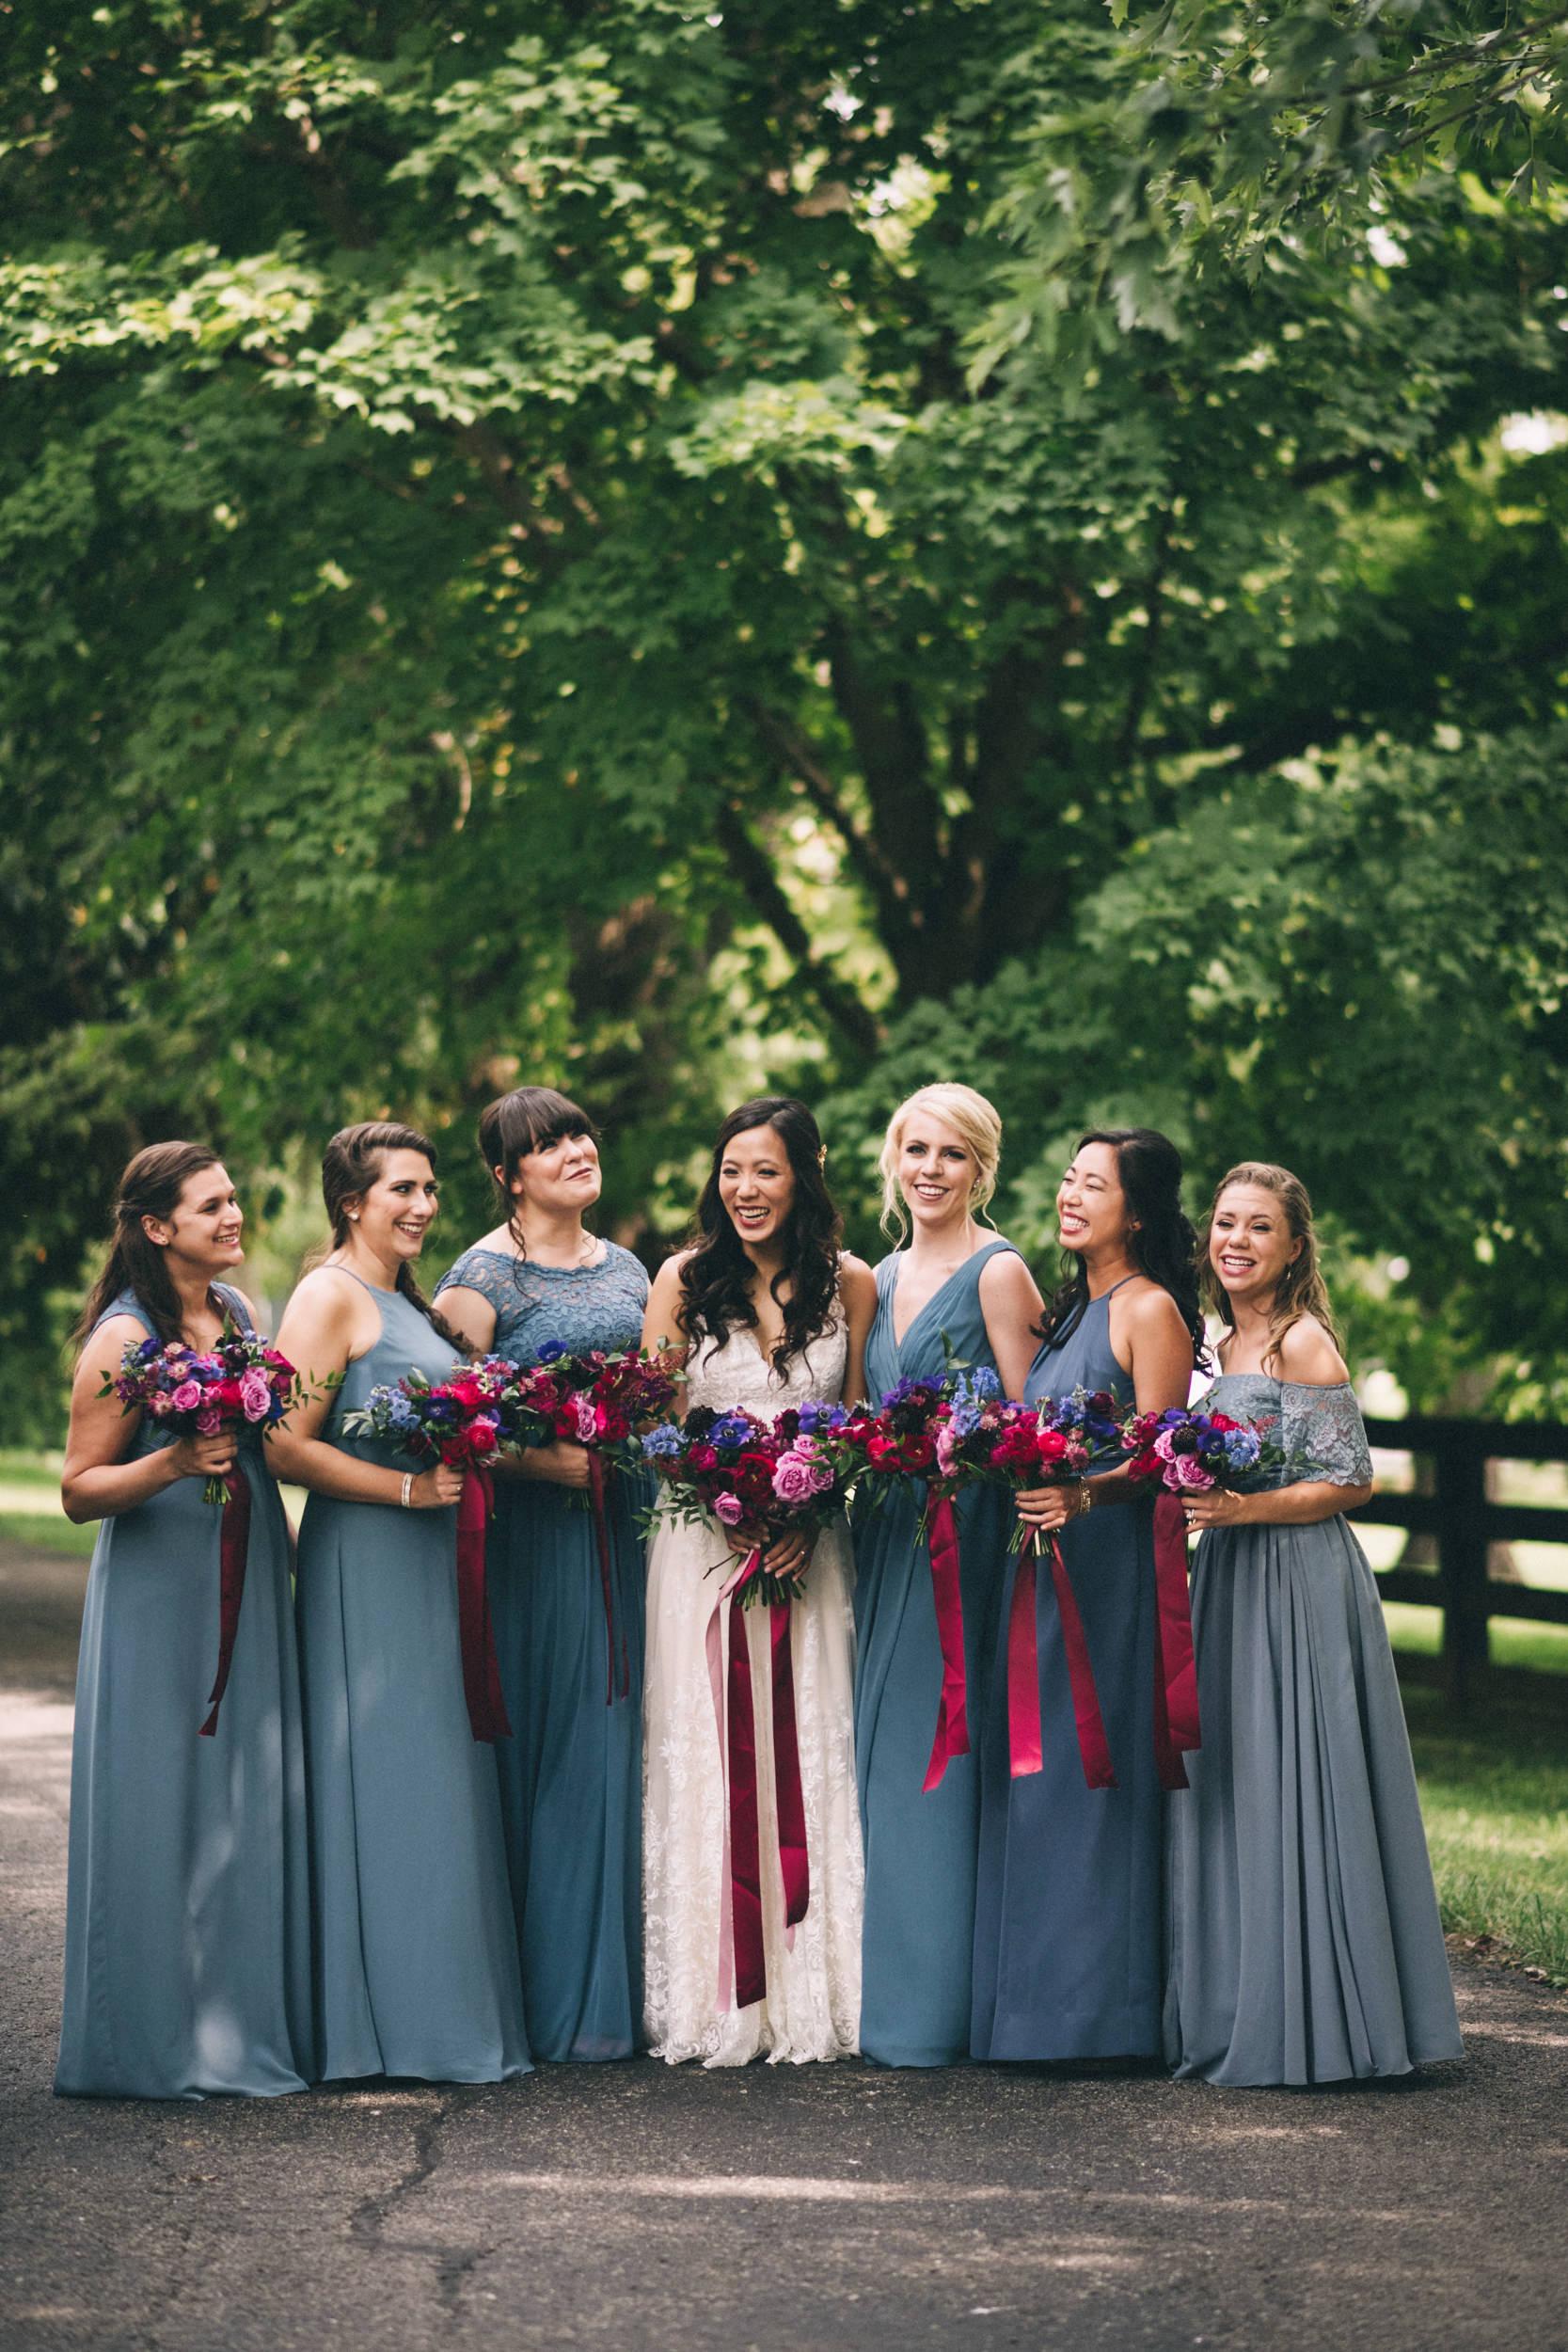 Louisville-Kentucky-Wedding-and-Elopement-Photographer-Sarah-Katherine-Davis-Photography-Summer-Jewel-Toned-Wedding-Chineese-Tea-Ceremony-Warrenwood-Manor-Danville-264.jpg